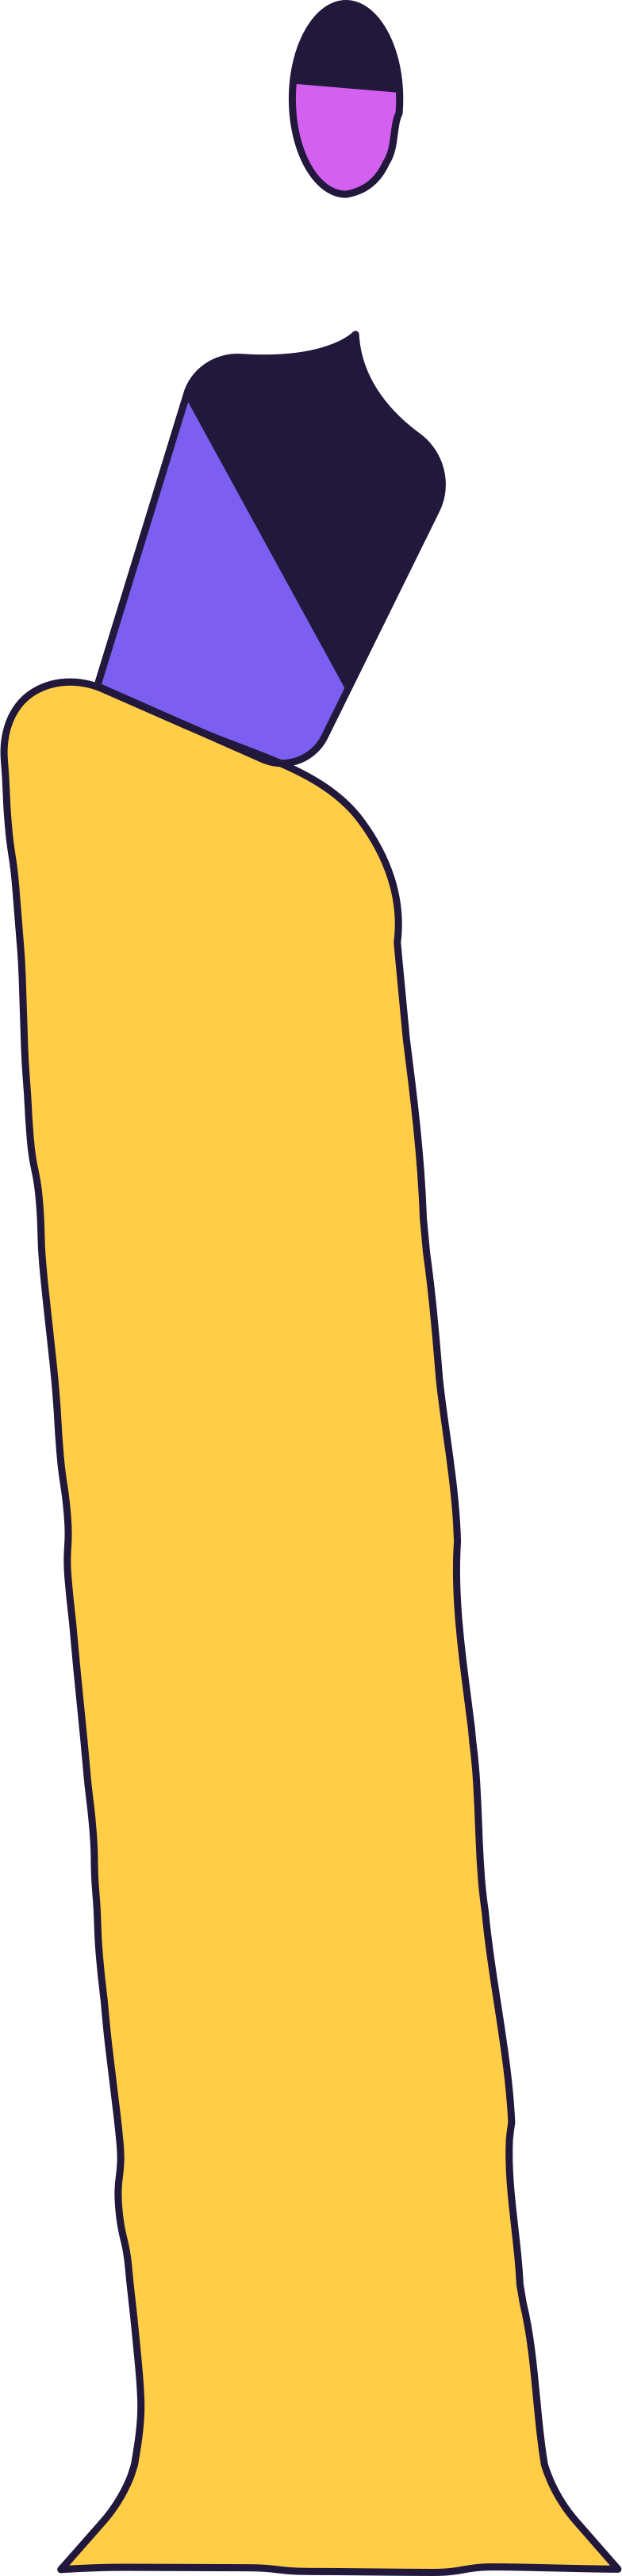 order complete  little person Clipart illustration in PNG, SVG